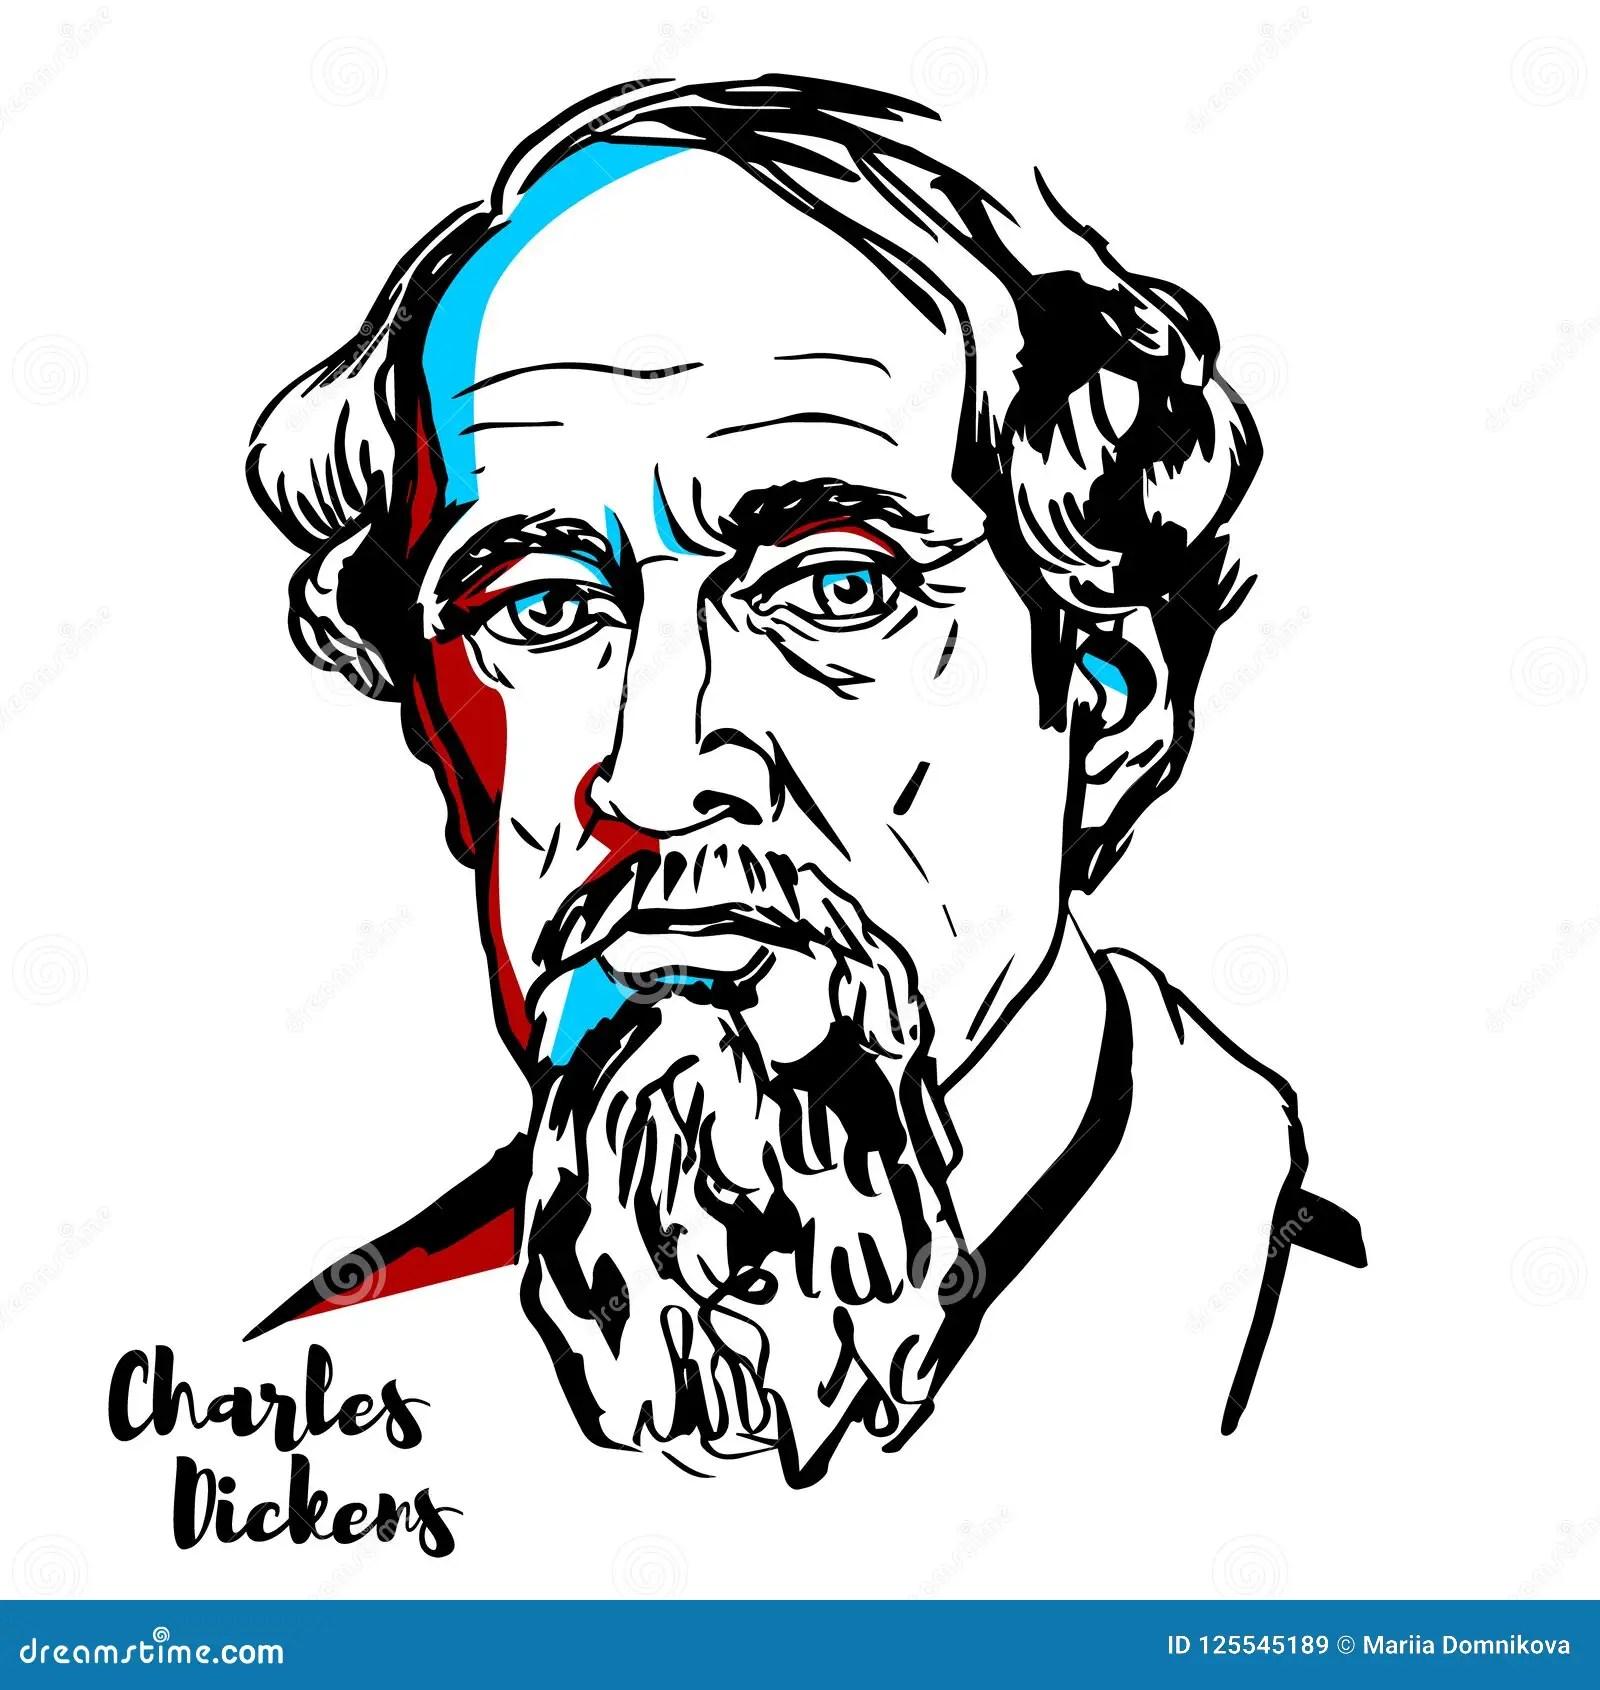 Charles Dickens Portret Vector Illustratie Illustratie